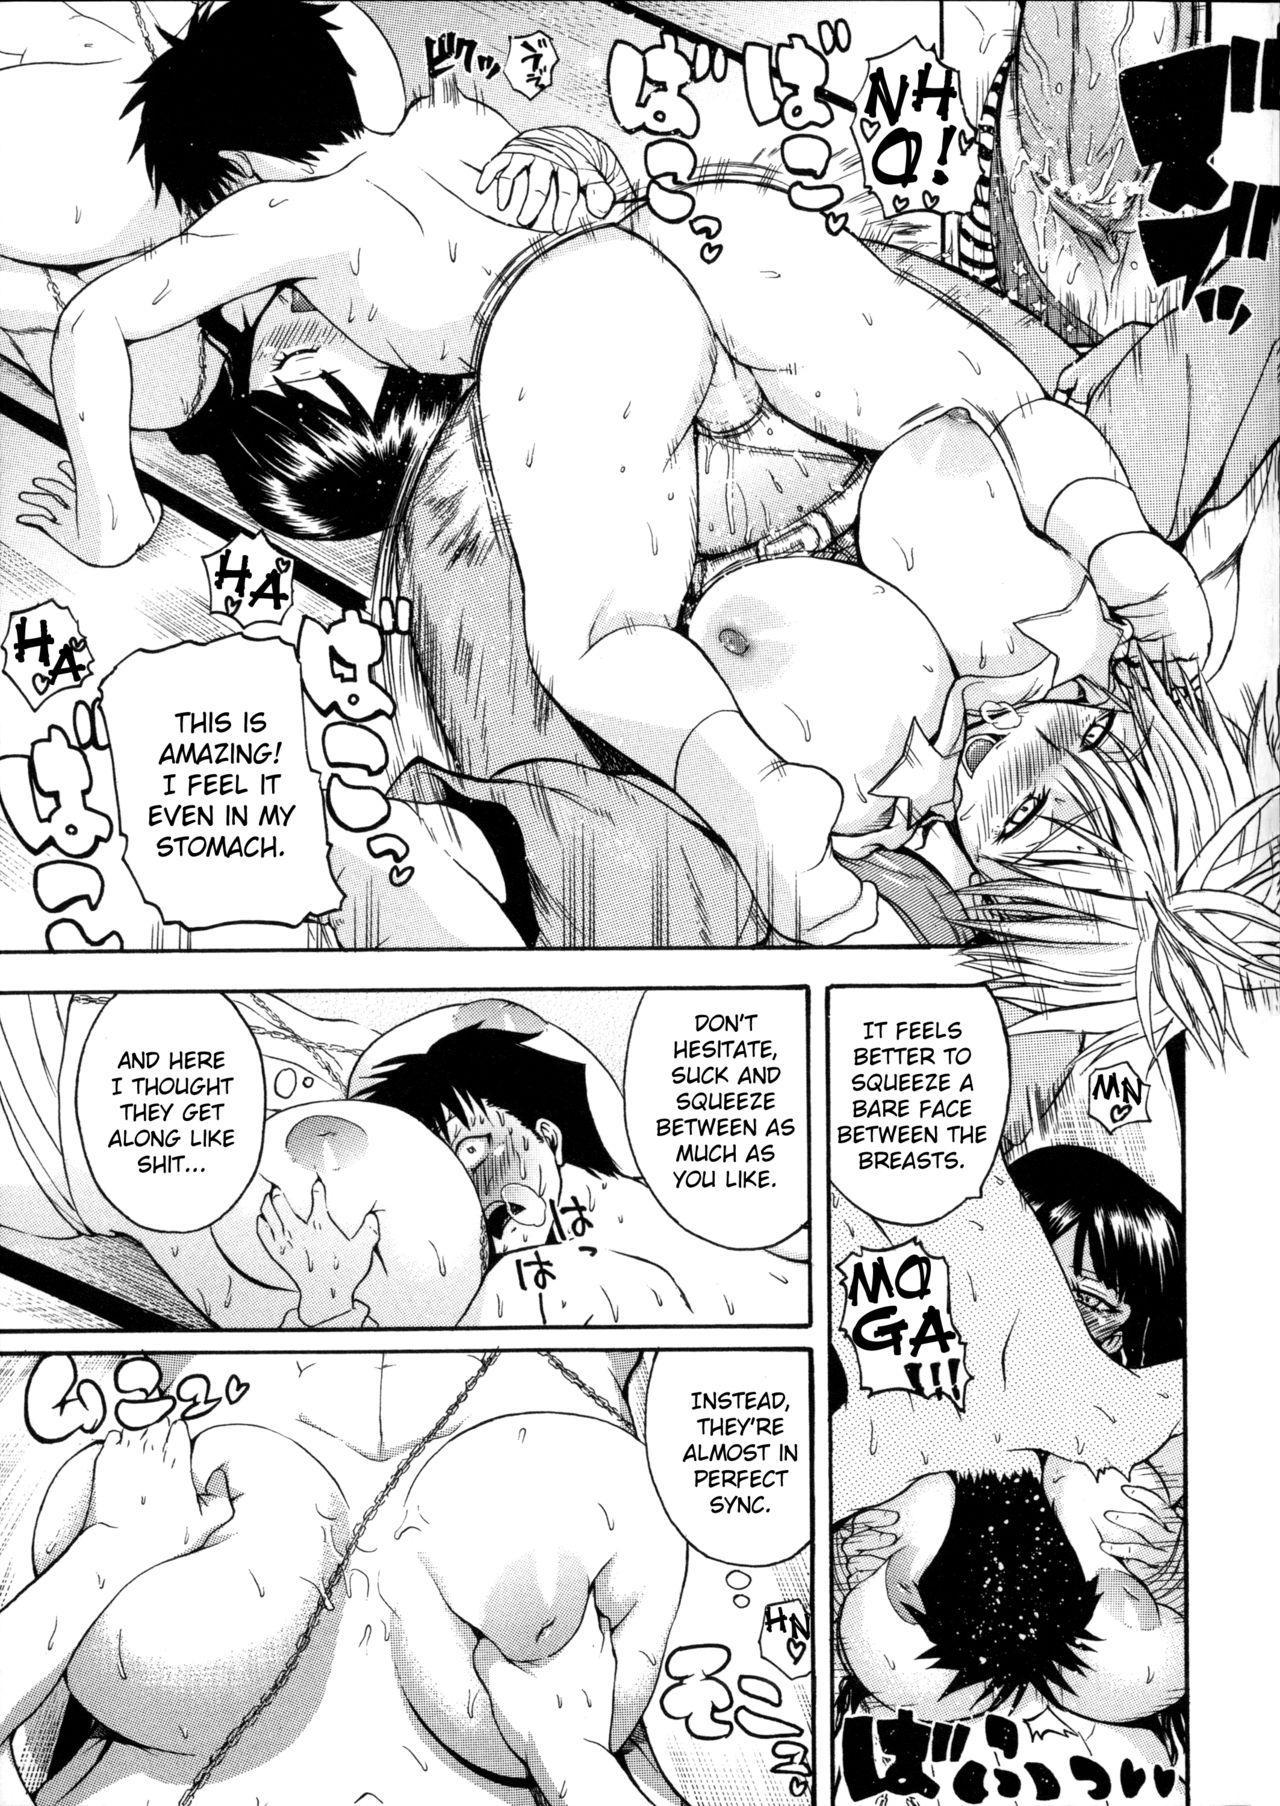 [Yoshimura Tatsumaki] Monzetsu Taigatame ~Count 3 de Ikasete Ageru~ | Faint in Agony Bodylock ~I'll make you cum on the count of 3~ [English] [Brolen] 99